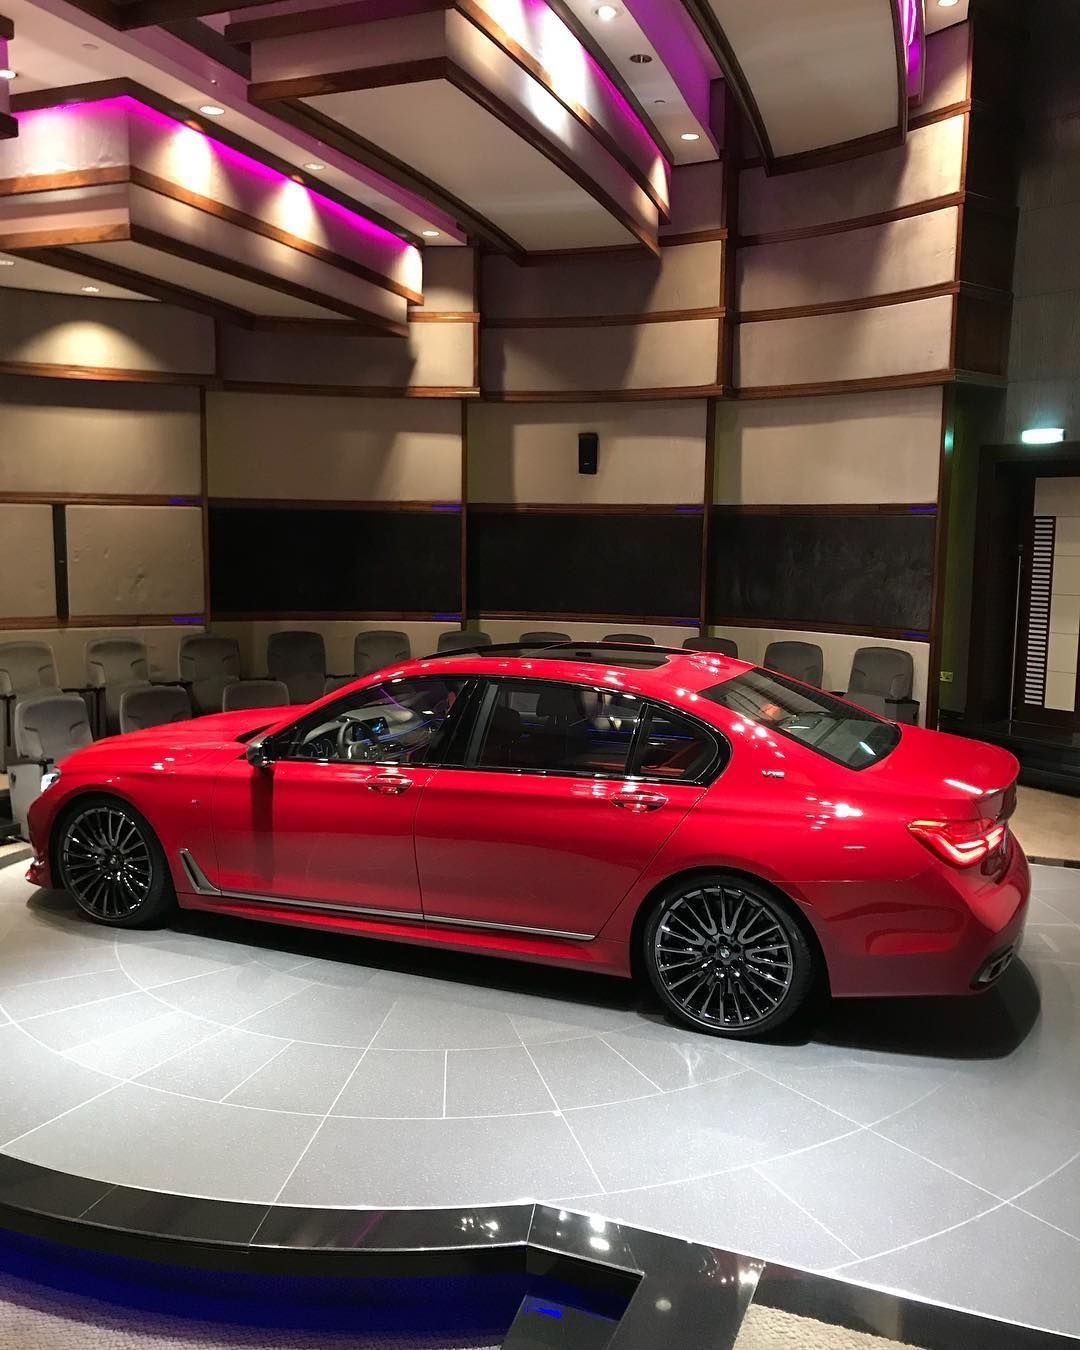 6 216 Vpodoban 20 Komentariv Rami Nasri Bmw Mini Rr Bmw Uae V Instagram Bmw M760li M Sport Imola Red V12 6 6 Li Bi Turb Car Engine Dream Cars Bmw